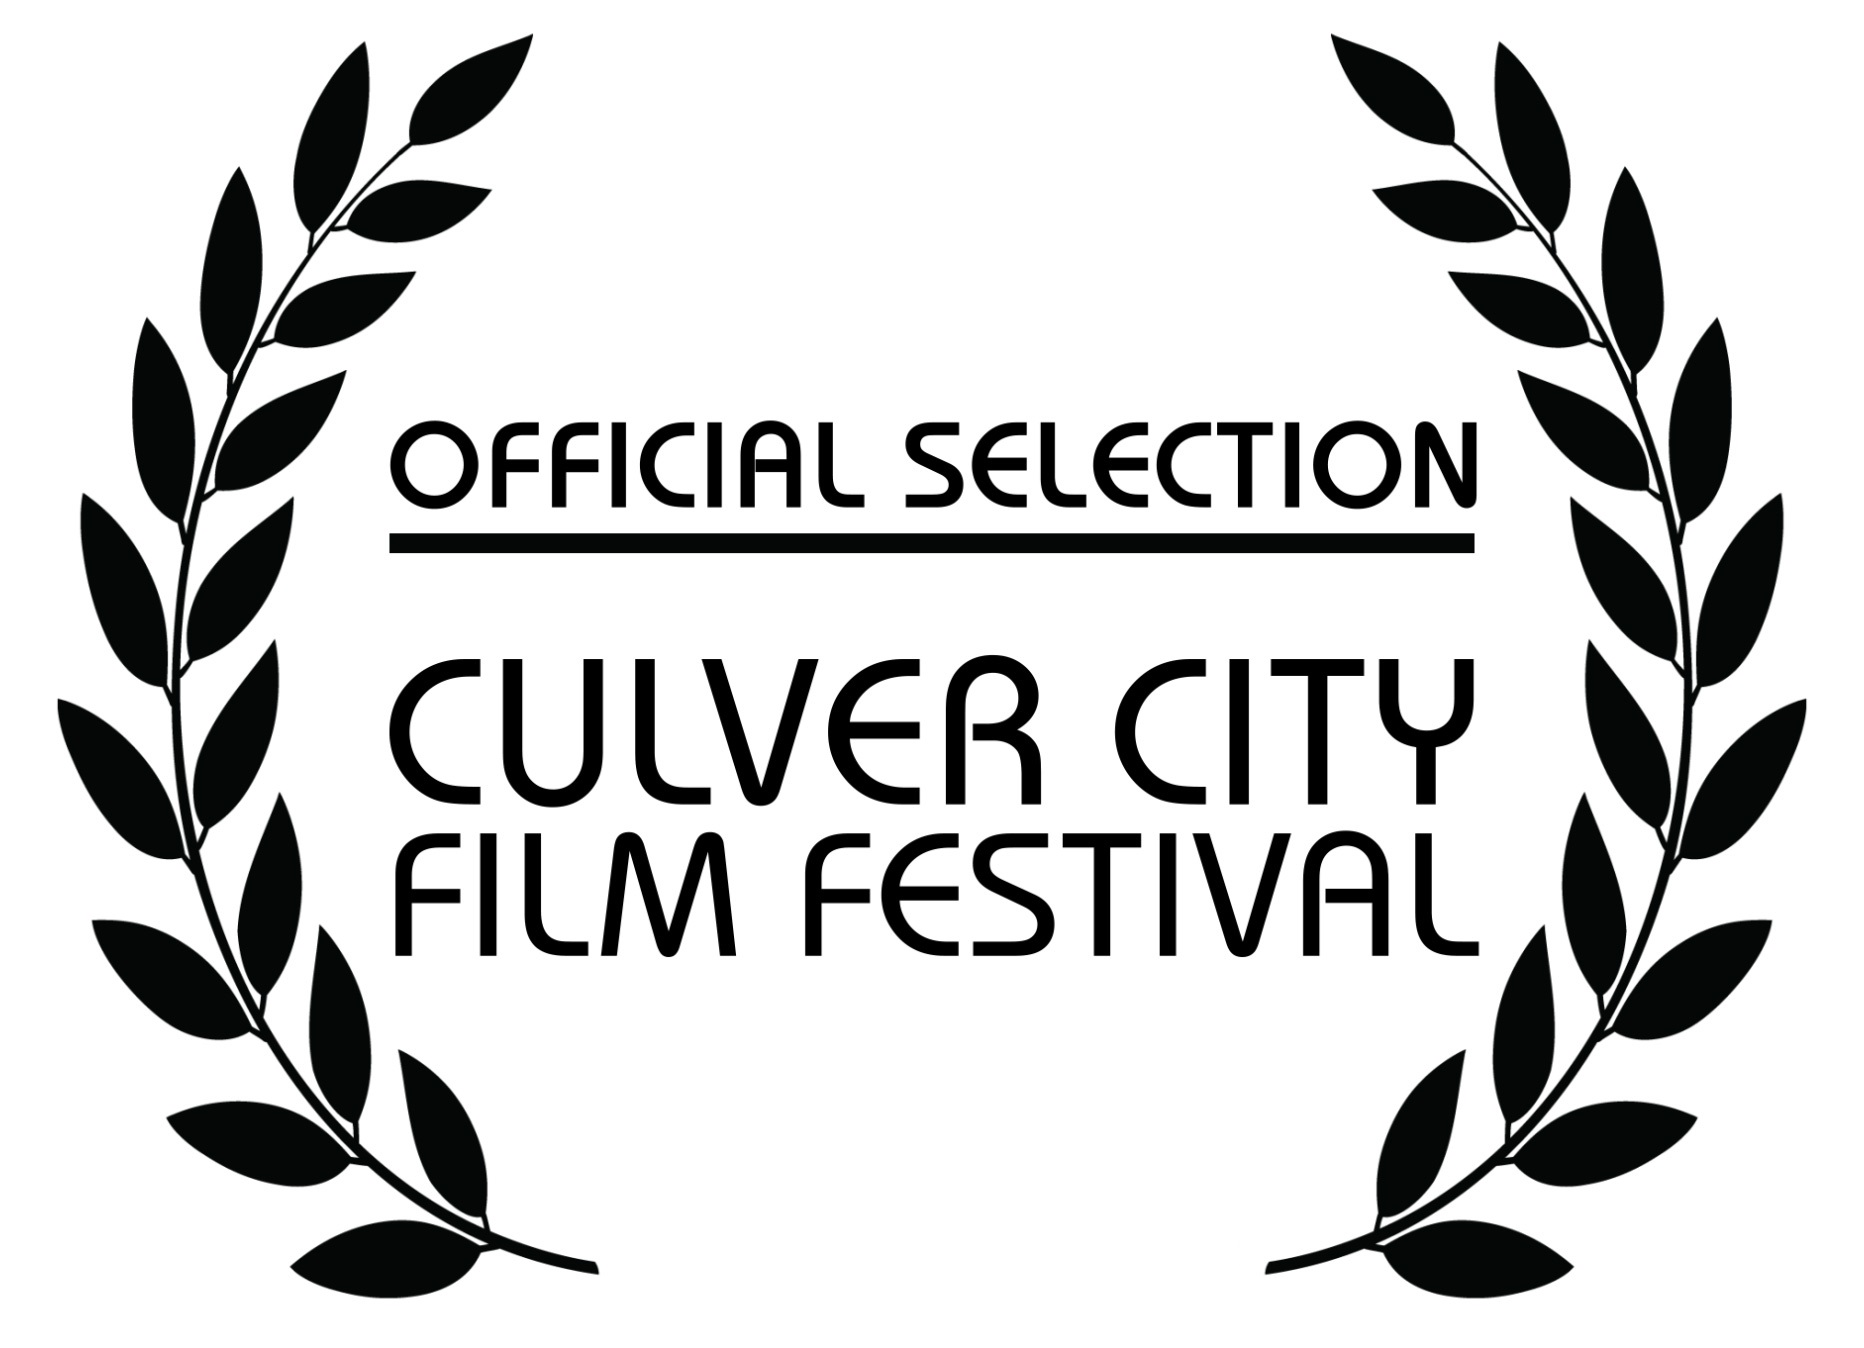 Culver City Film Festival - Copy.jpg